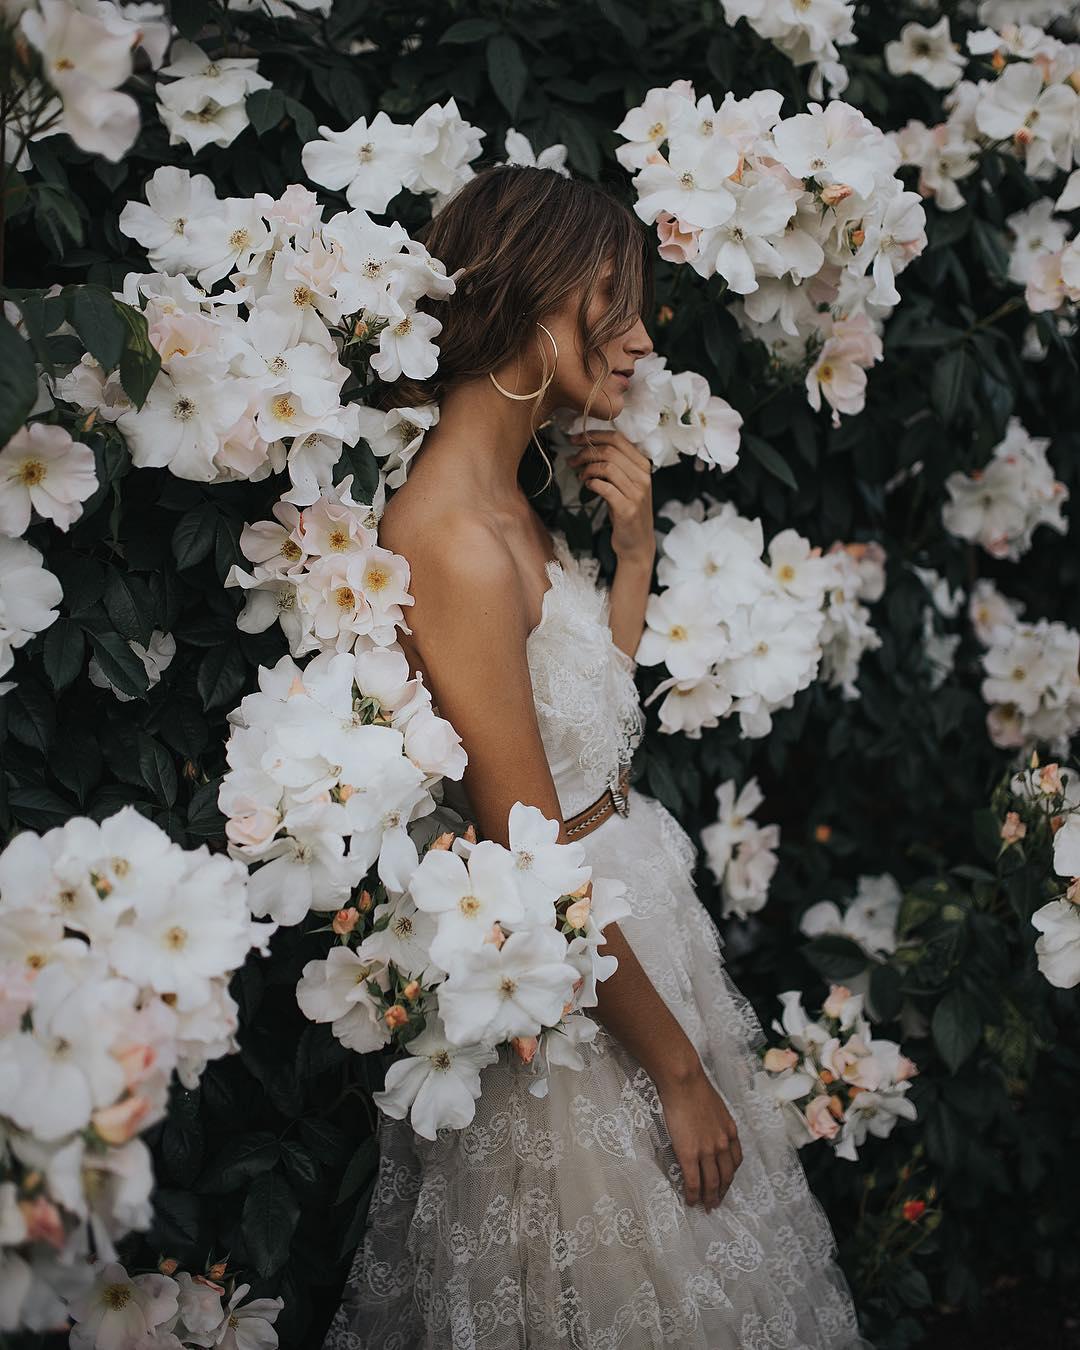 Gorgeous Flower Portrait Photography by Paarsa Hajari